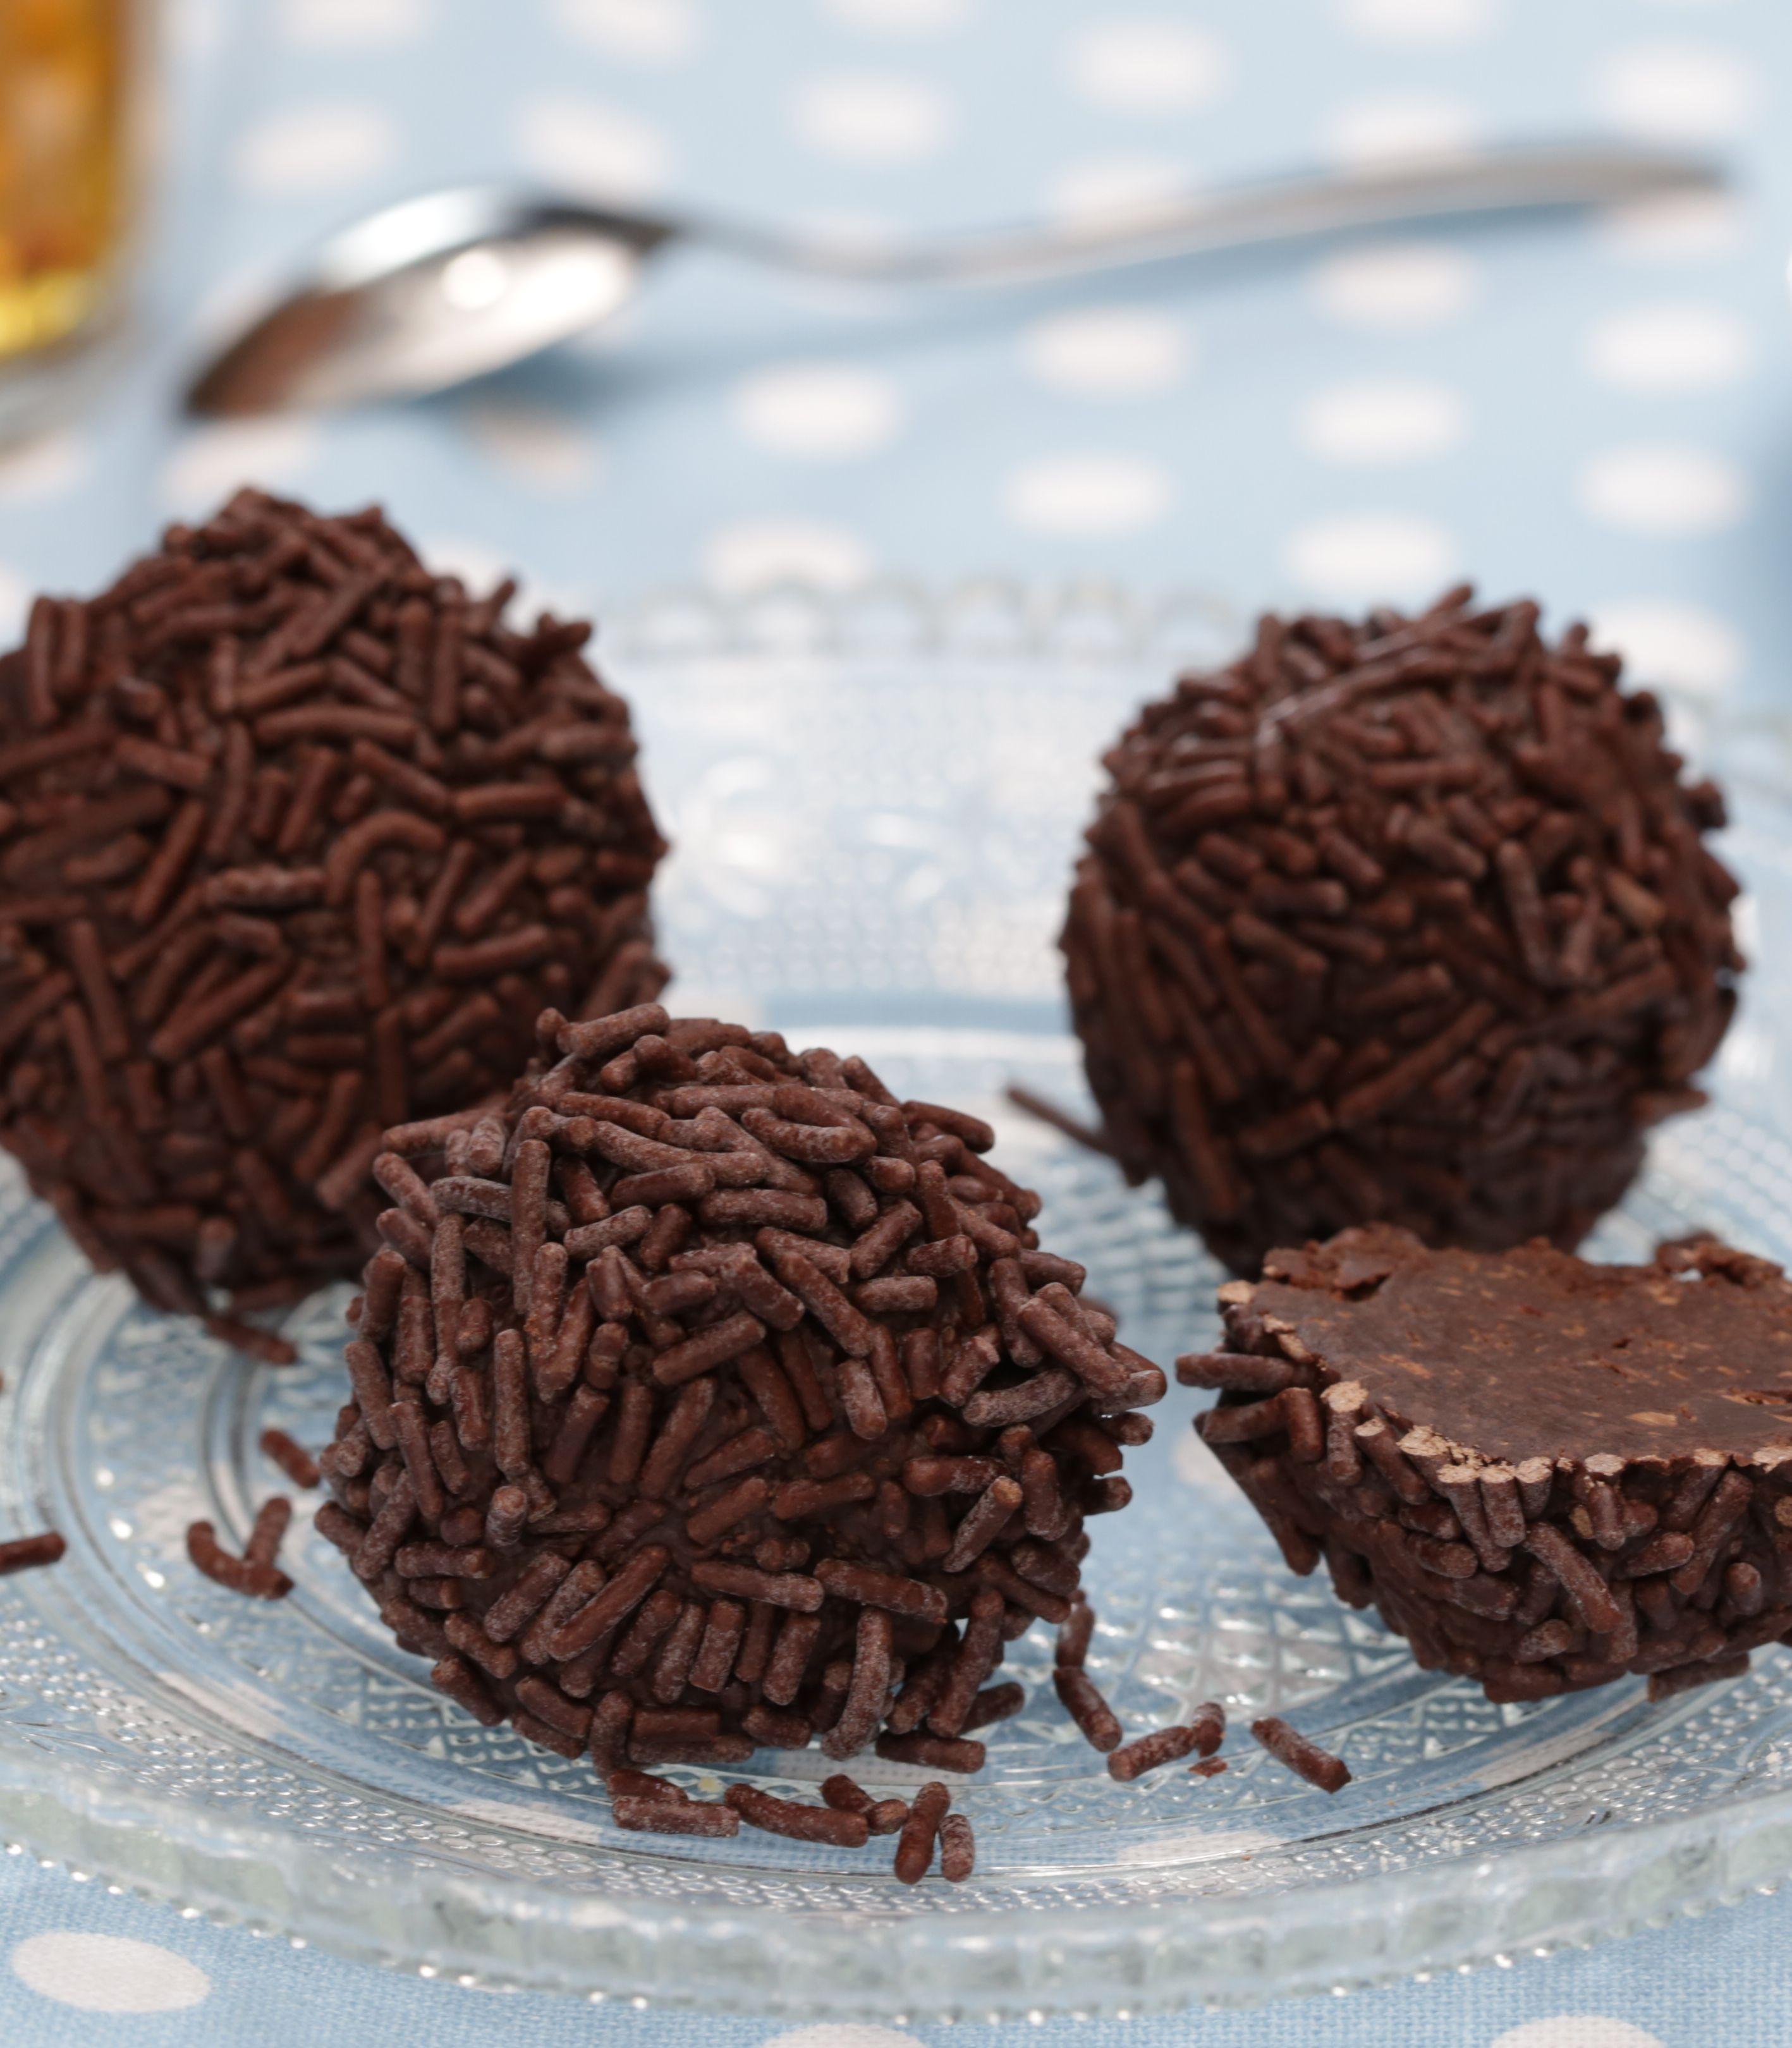 rumkugeln selber machen desserts pinterest food kuchen and truffle. Black Bedroom Furniture Sets. Home Design Ideas